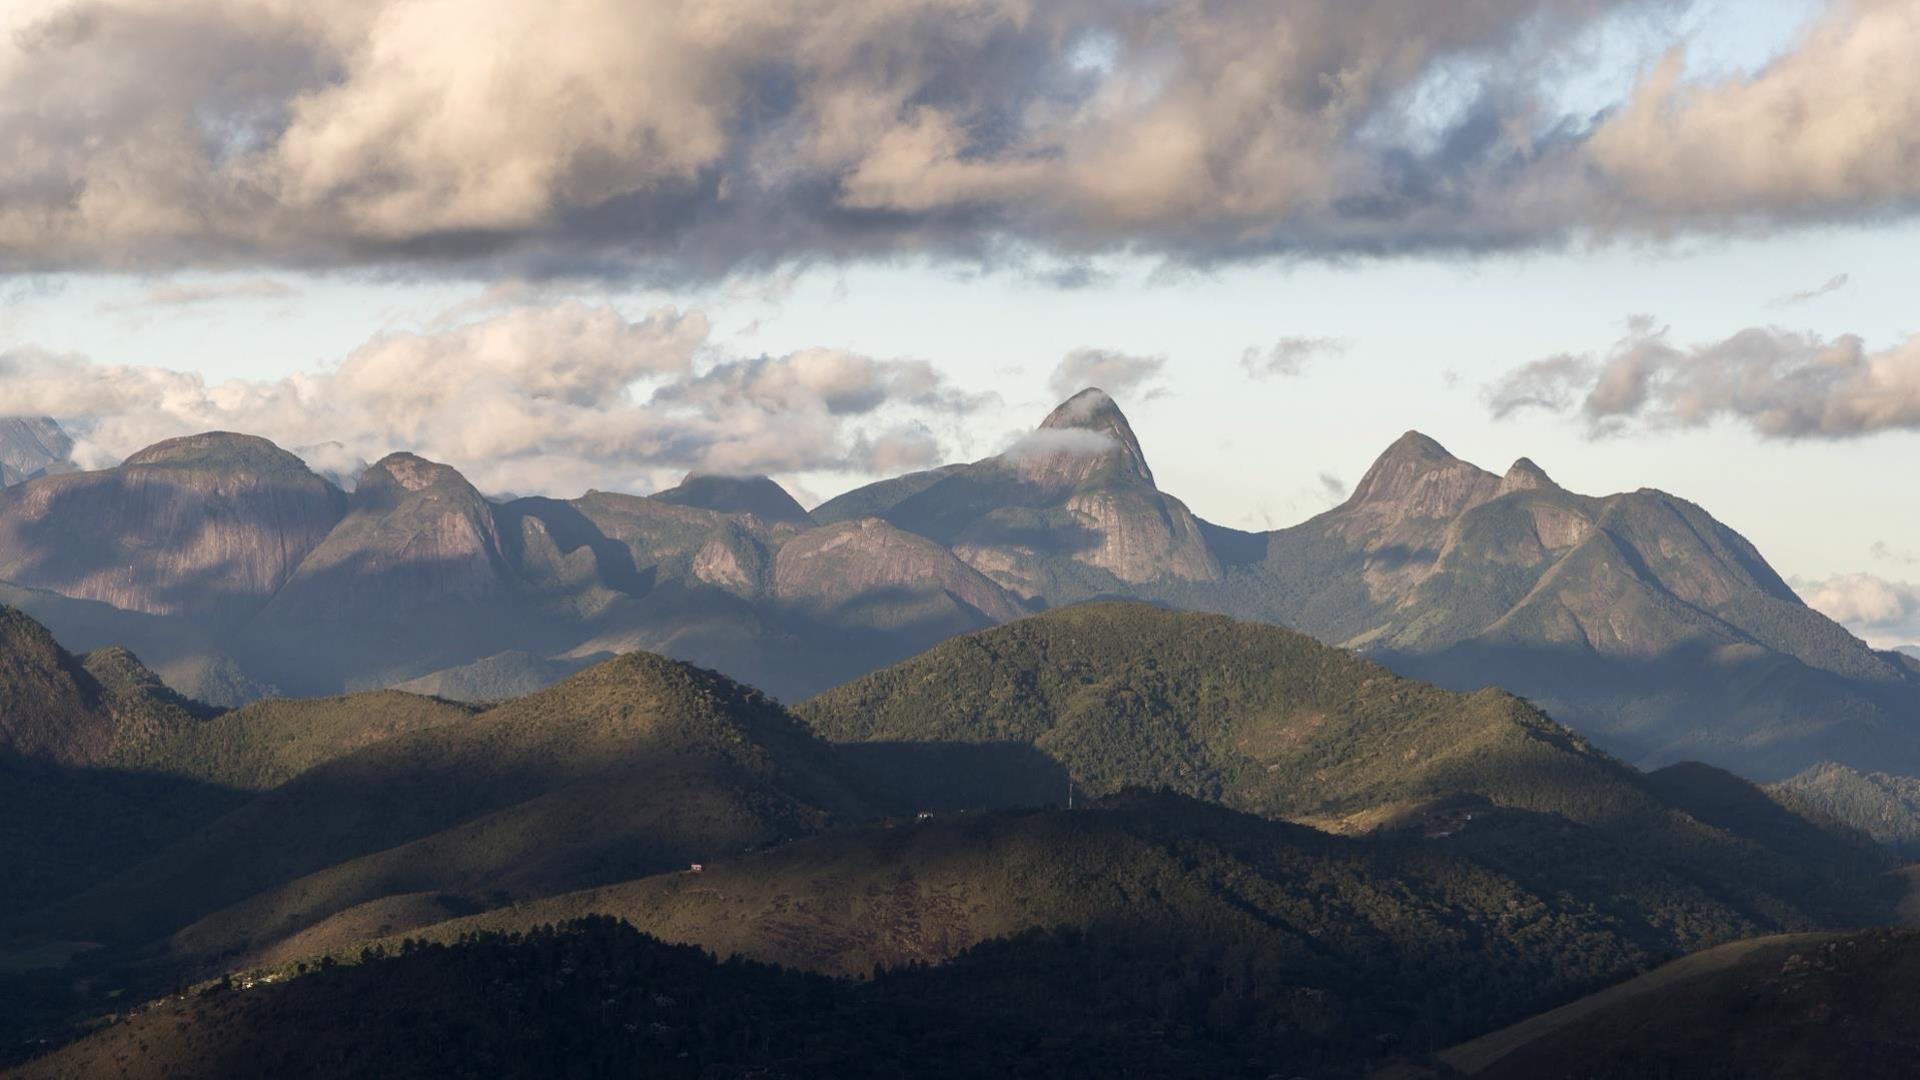 Eco Lodge Itororo Package - 3 Days in the Organ Mountains near Nova Friburgo